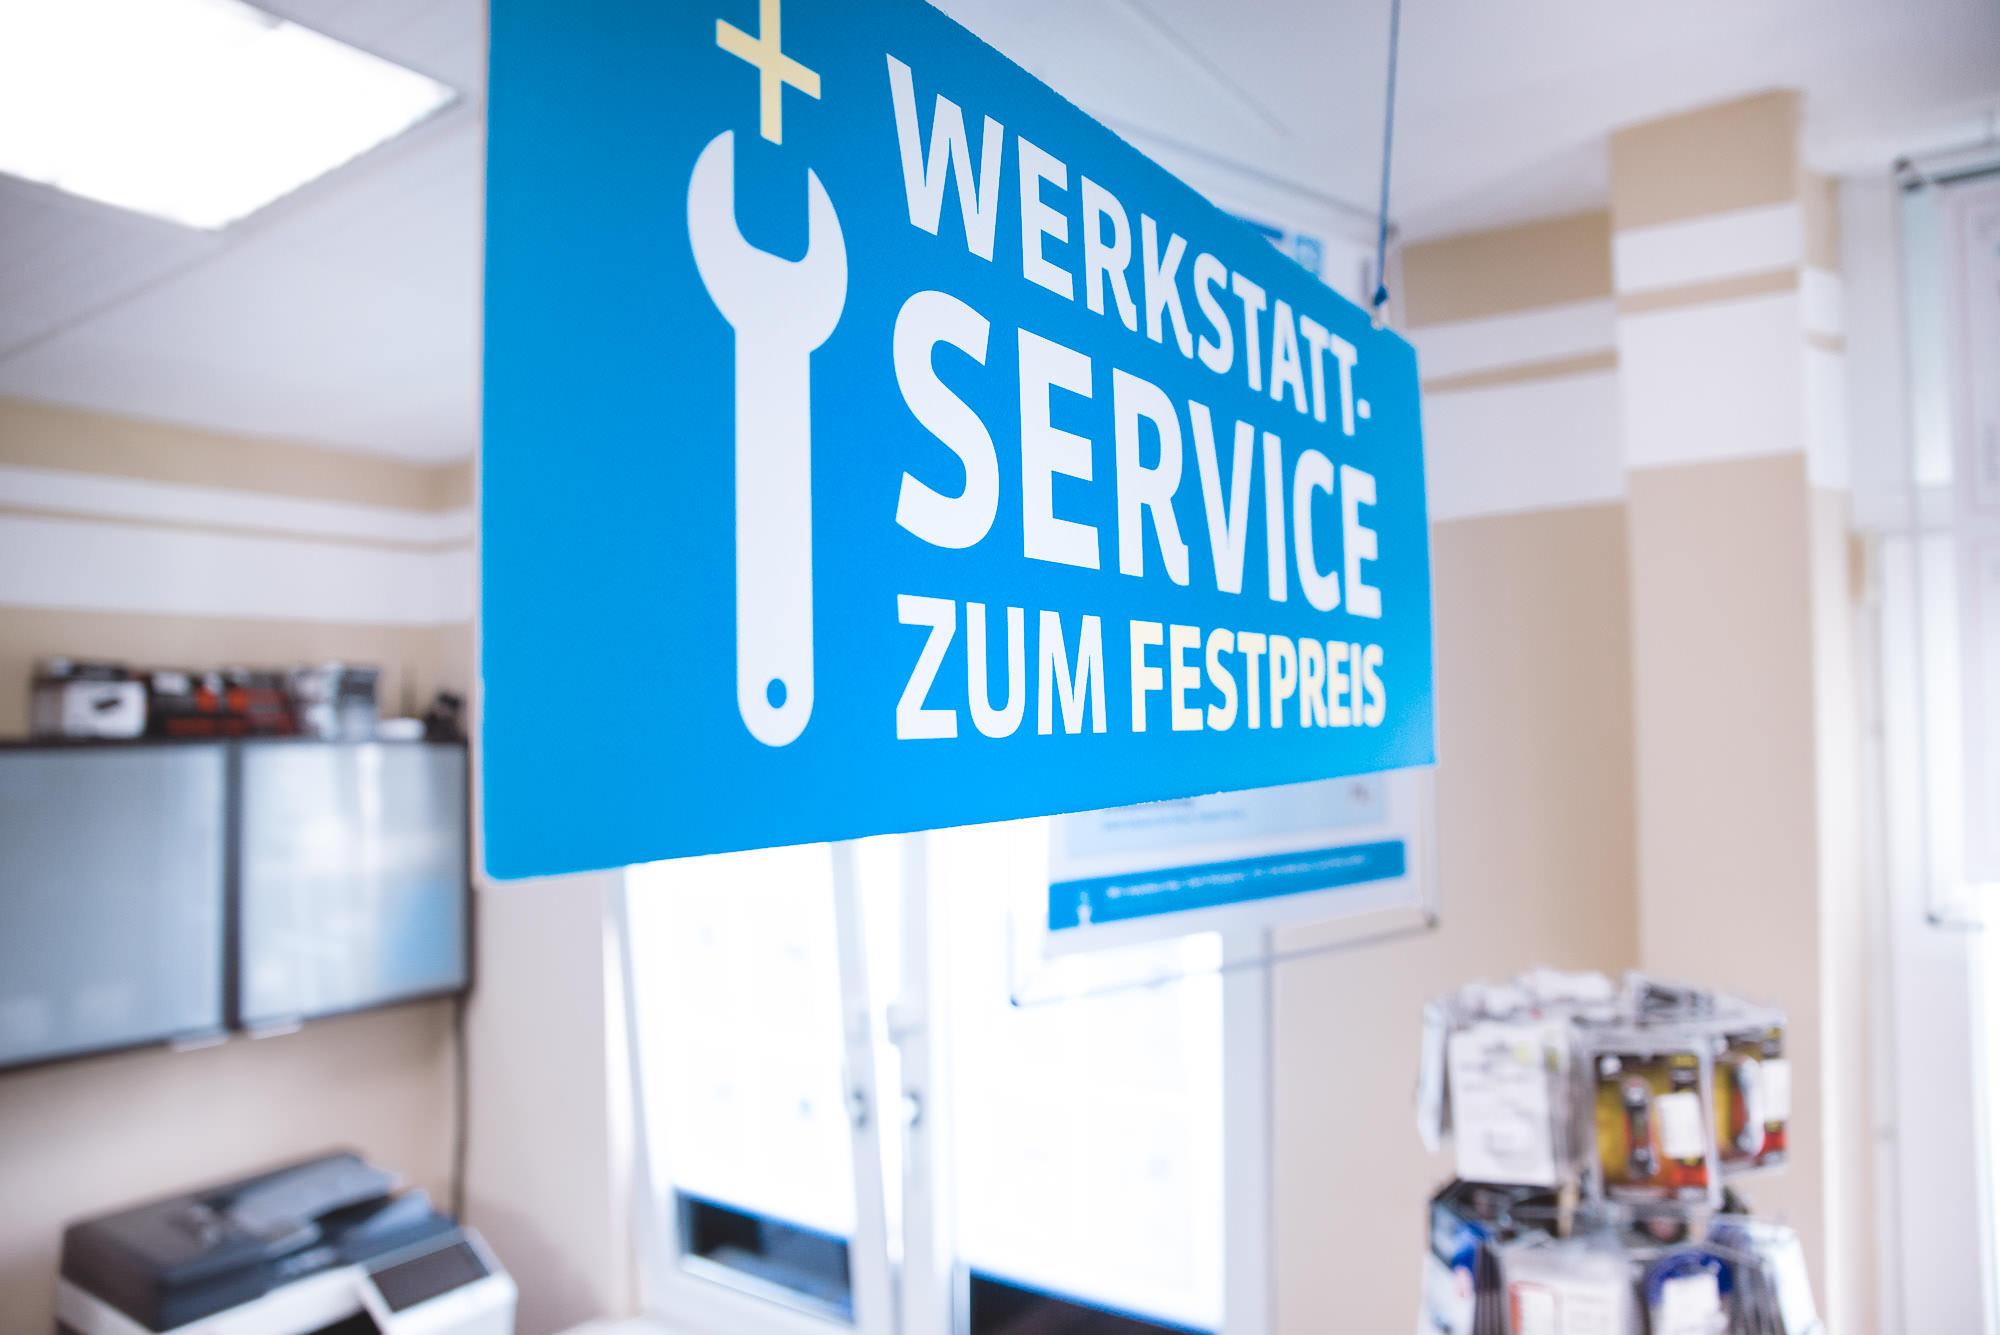 PC Spezialist gevelsberg - Service zum Festpreis